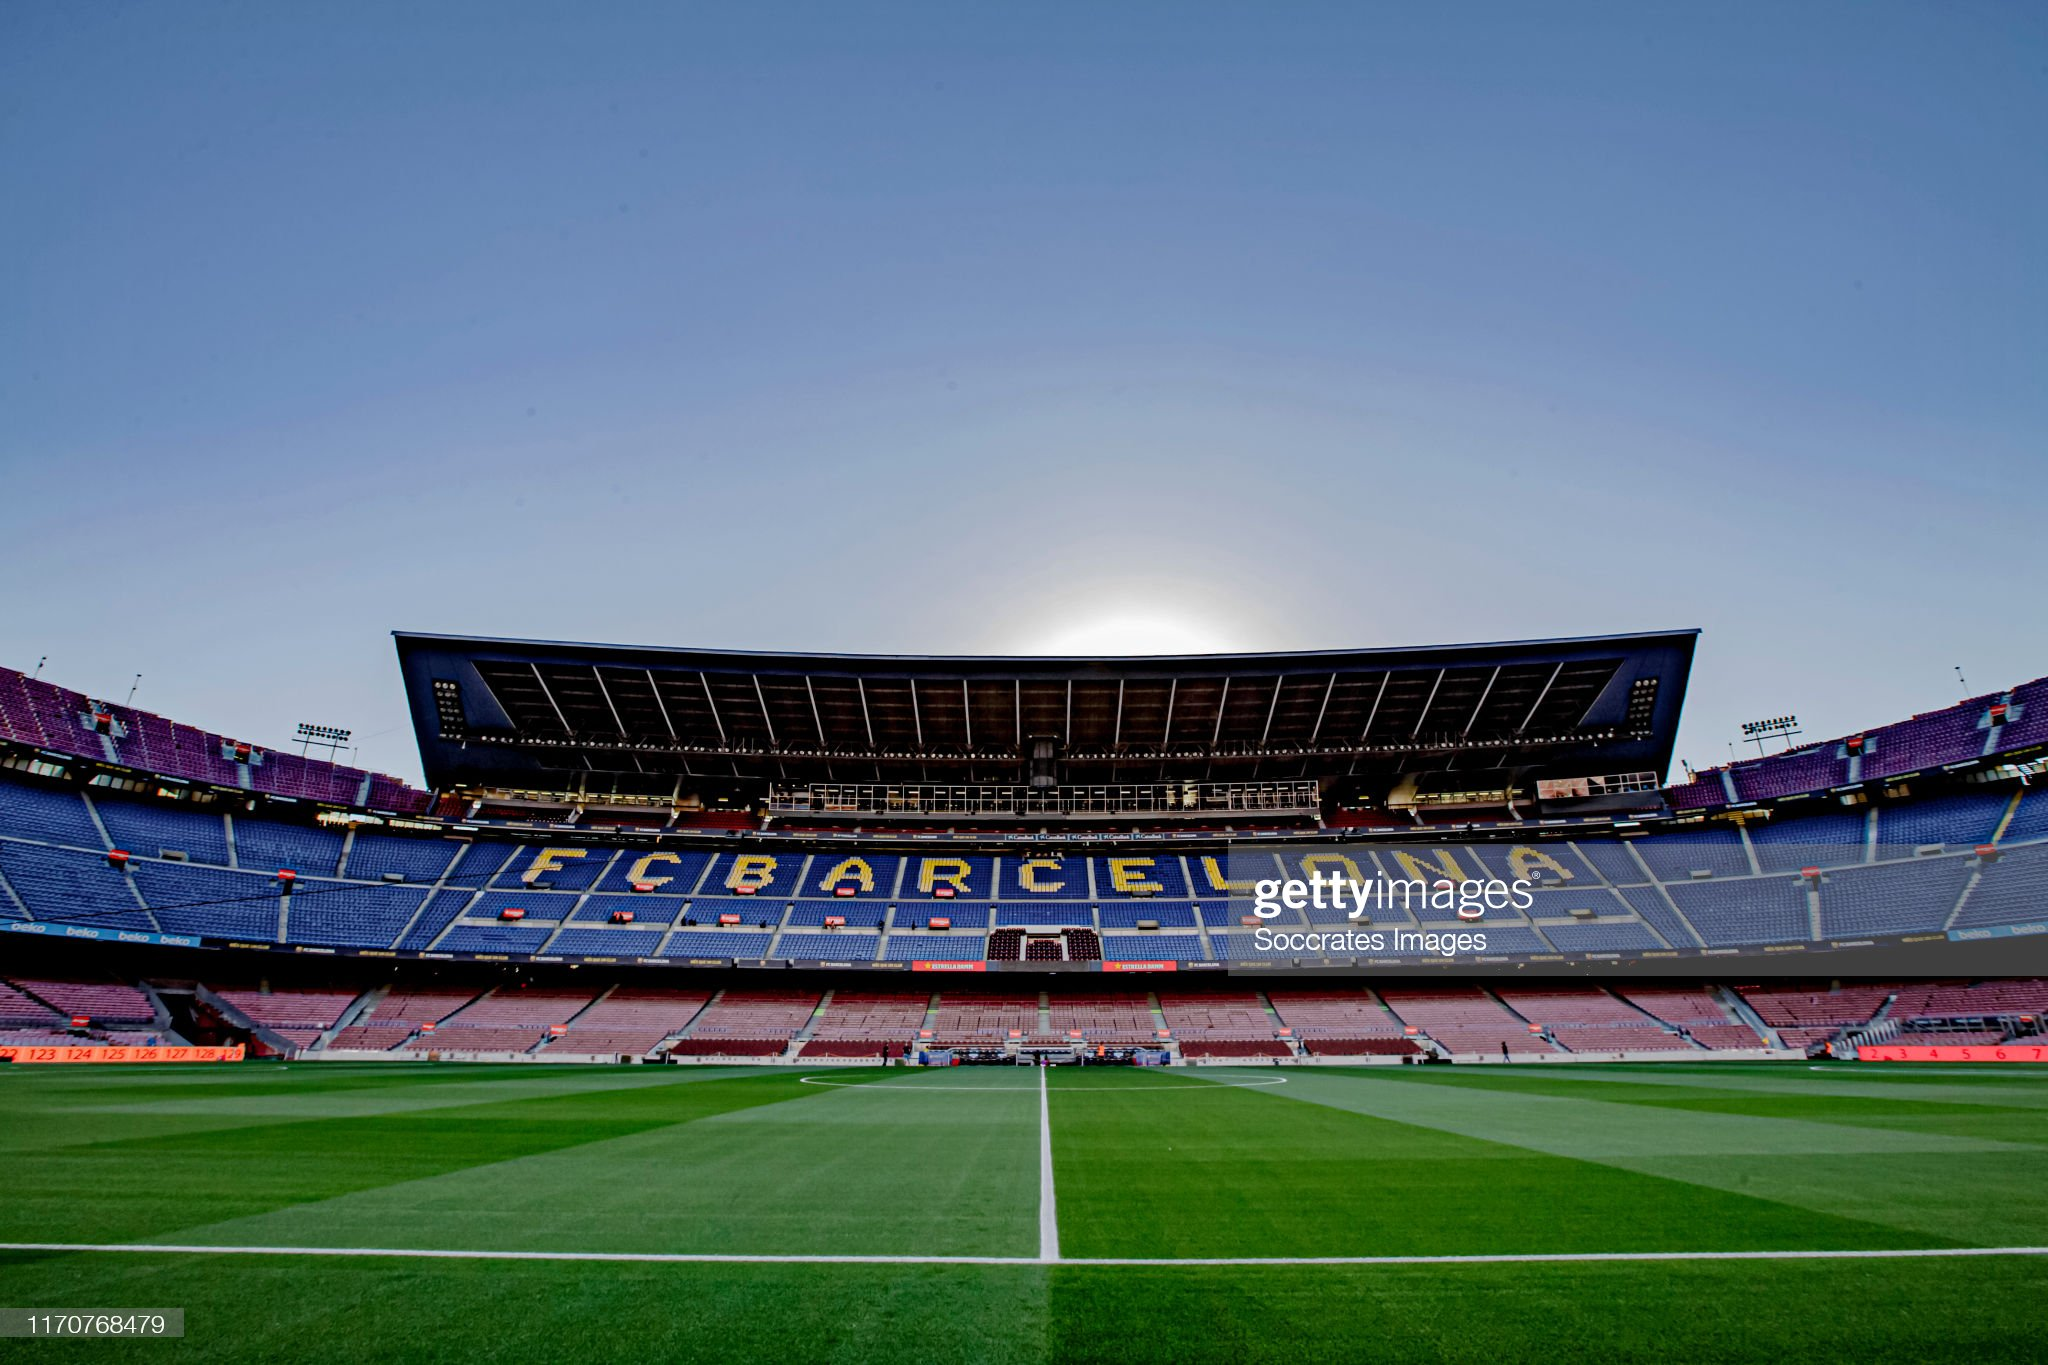 صور مباراة : برشلونة - فياريال 2-1 ( 24-09-2019 )  Stadium-of-fc-barcelona-during-the-la-liga-santander-match-between-fc-picture-id1170768479?s=2048x2048